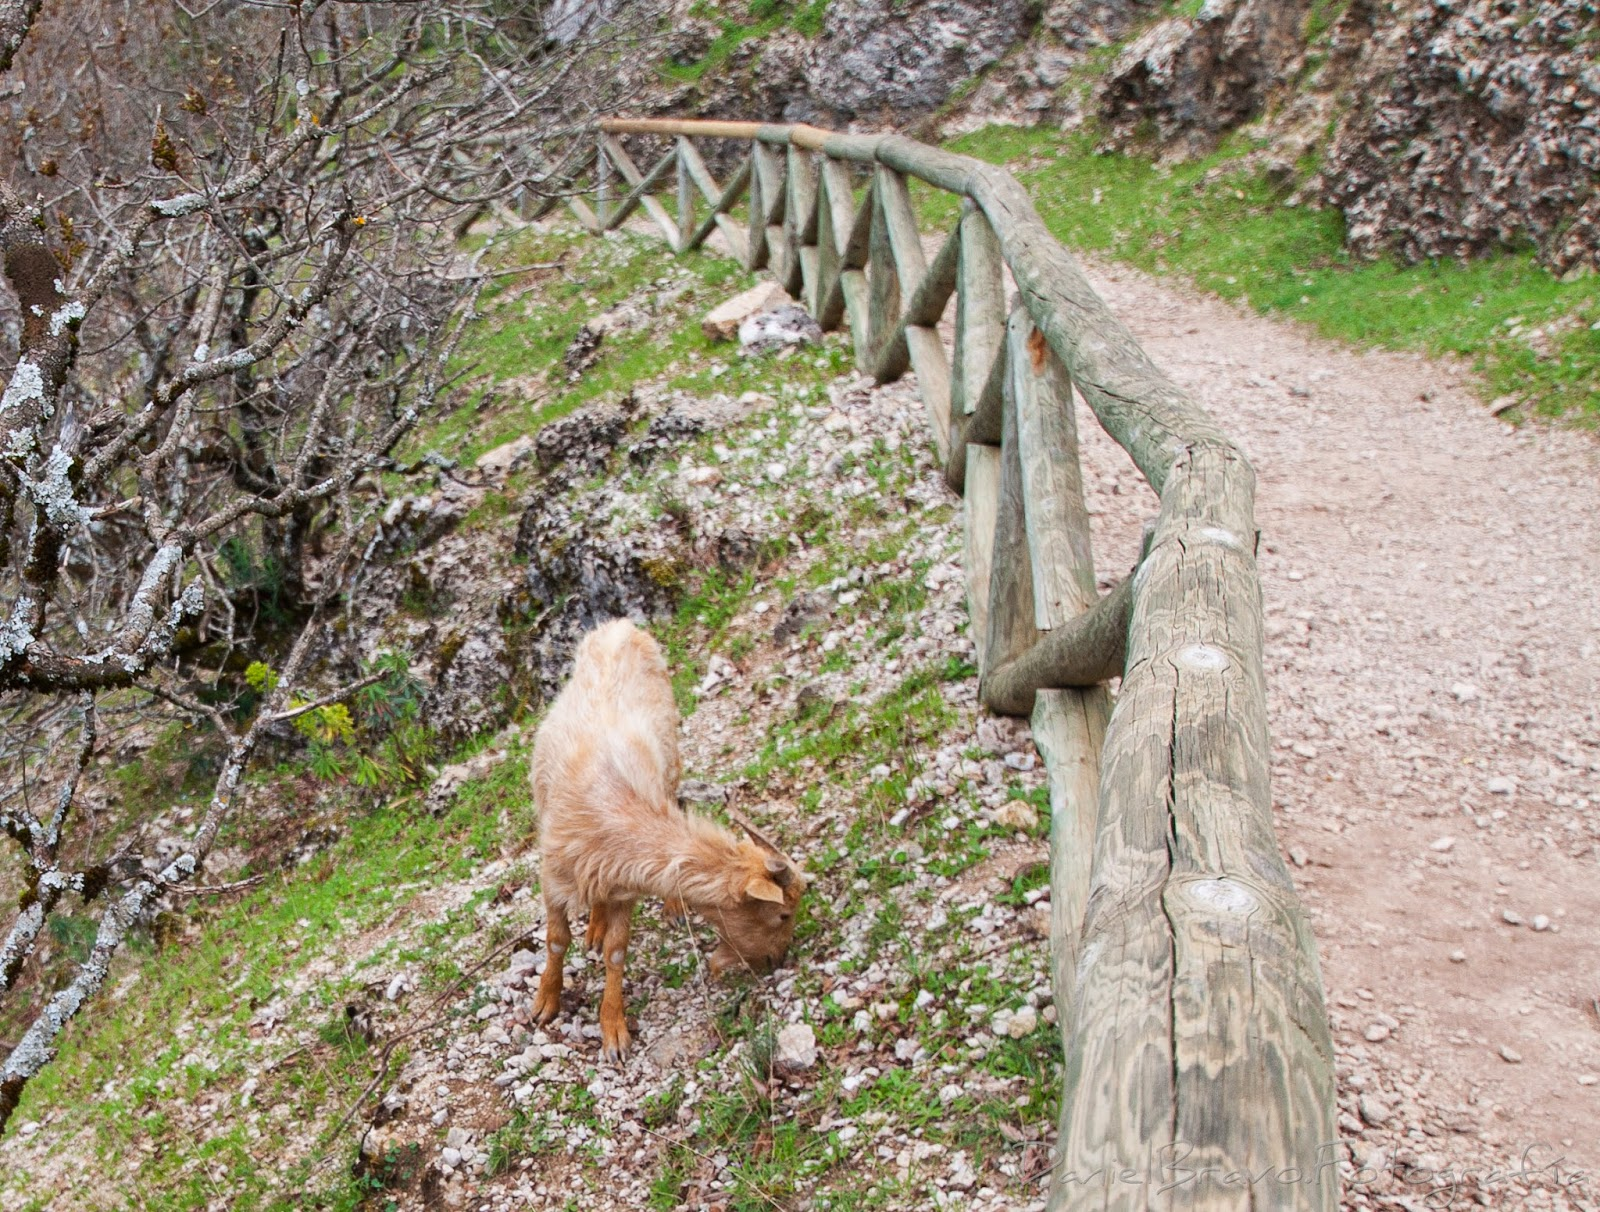 Cazorla, Sierra de Cazorla, rutas, senderos, Cerrada del Utrero